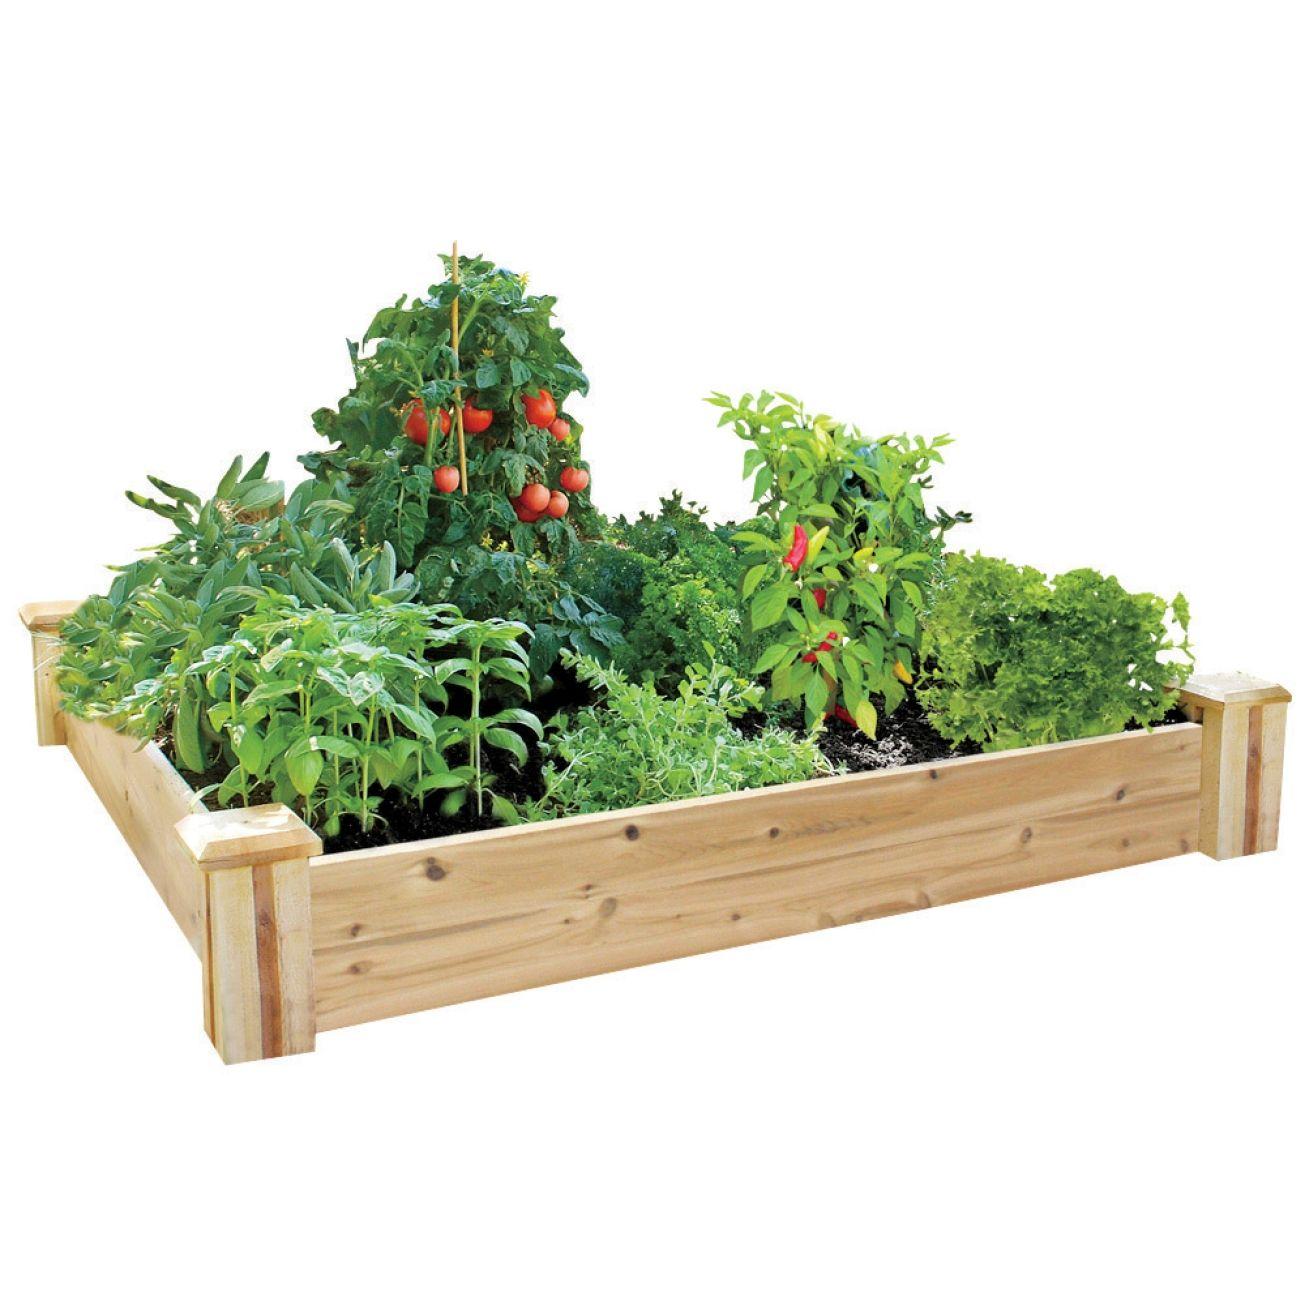 Greenes Cedar Raised Garden Kit Rc4c4 Specialty Garden